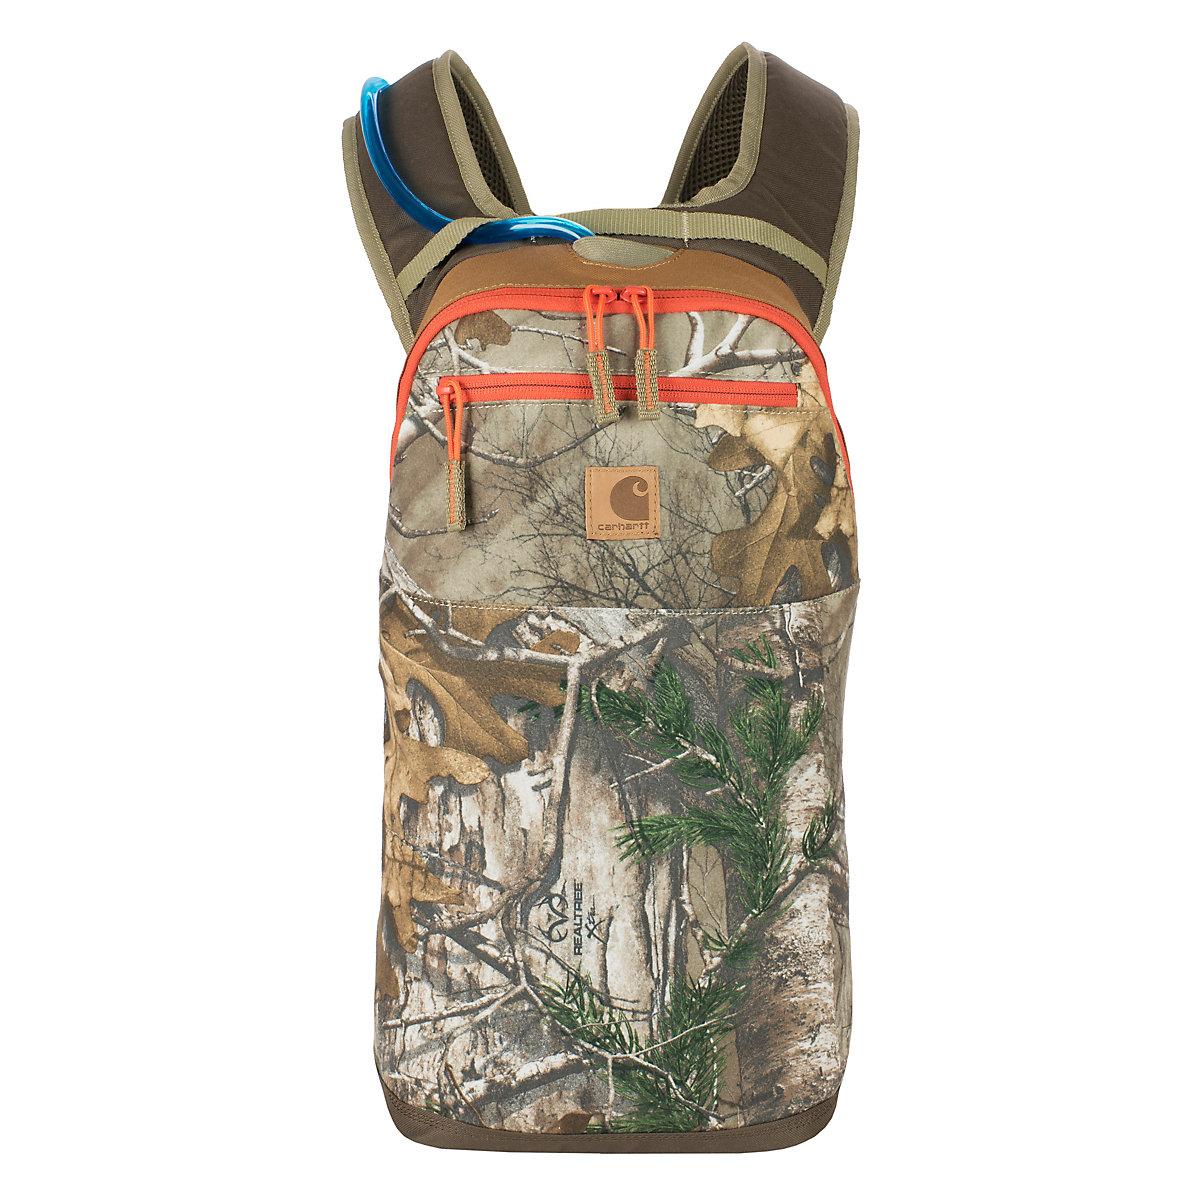 Unisex Hunt Hydration Pack 305503